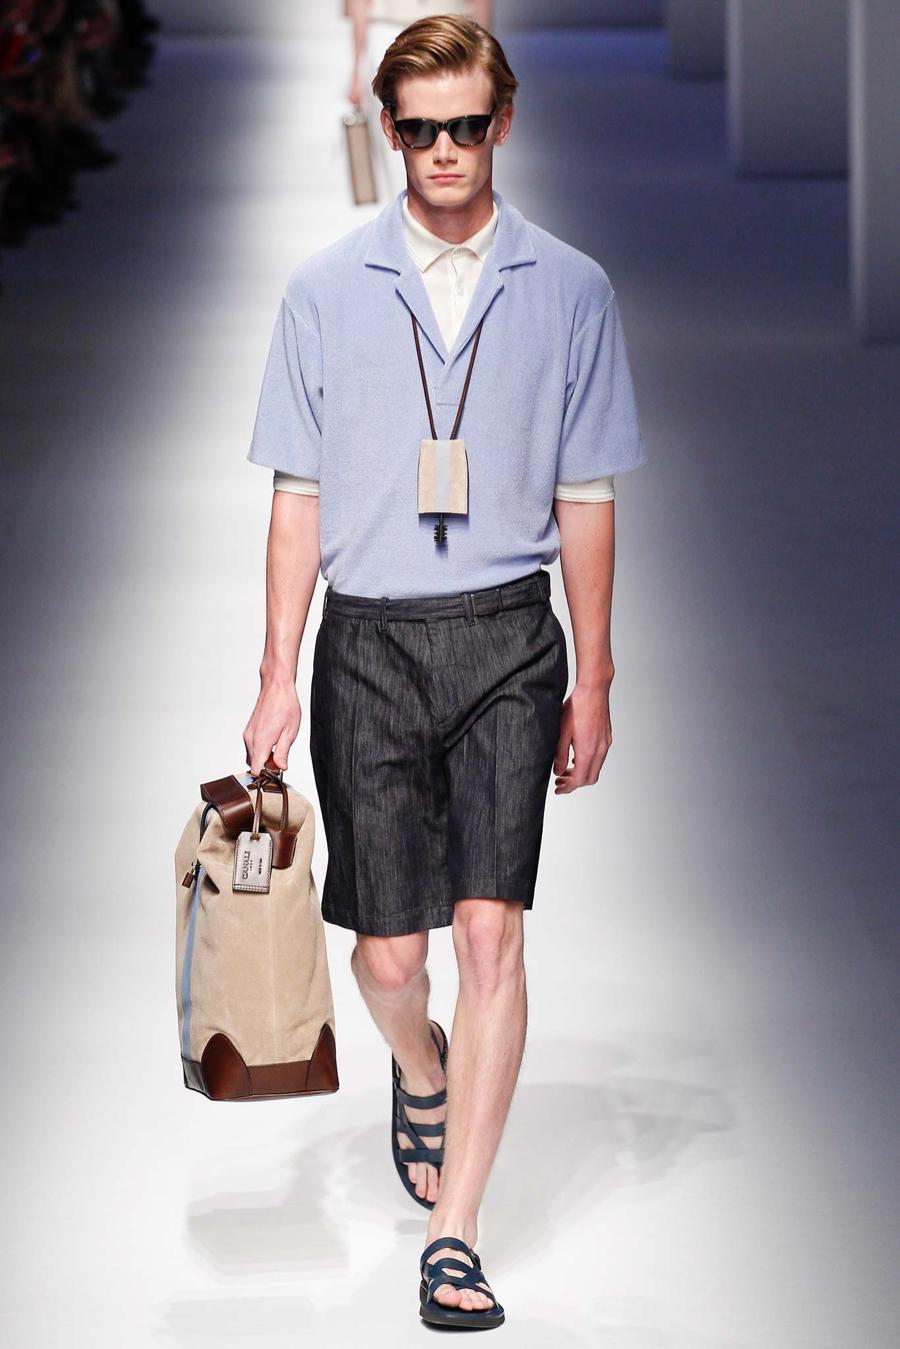 Canali Spring Summer 2016 Menswear Collection Milan